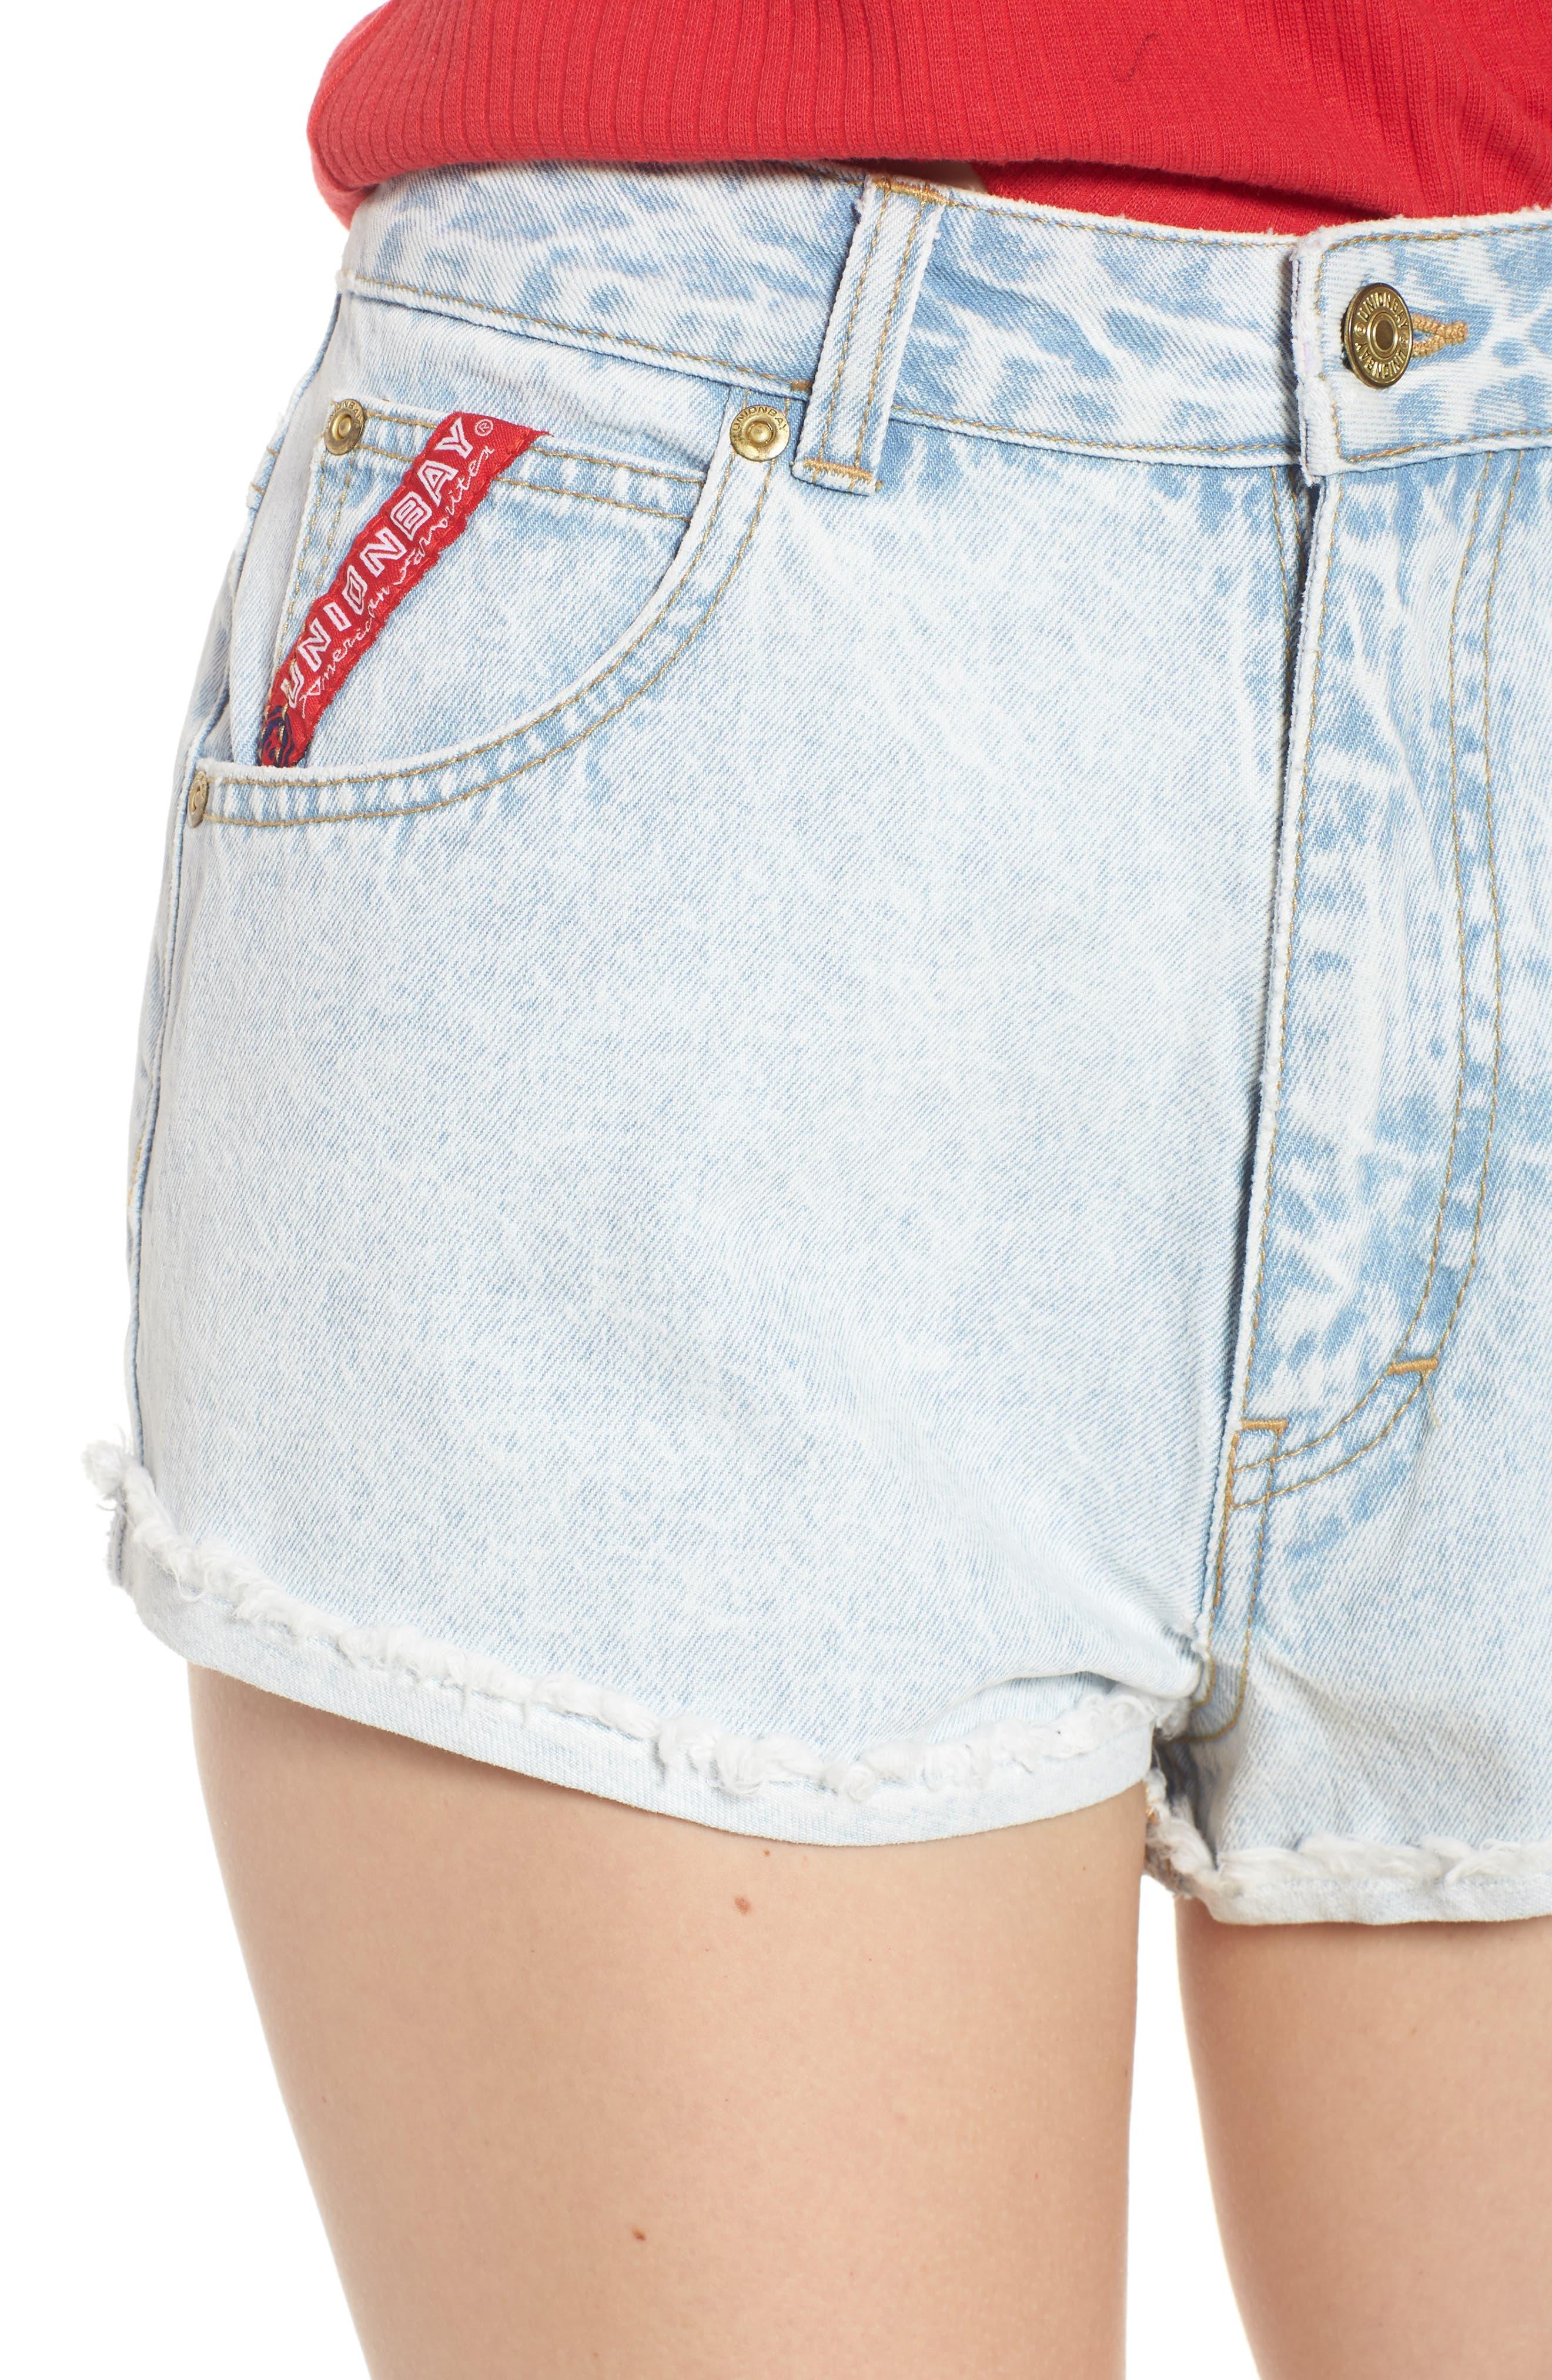 Unionbay Devo Acid Wash Denim Shorts,                             Alternate thumbnail 4, color,                             401